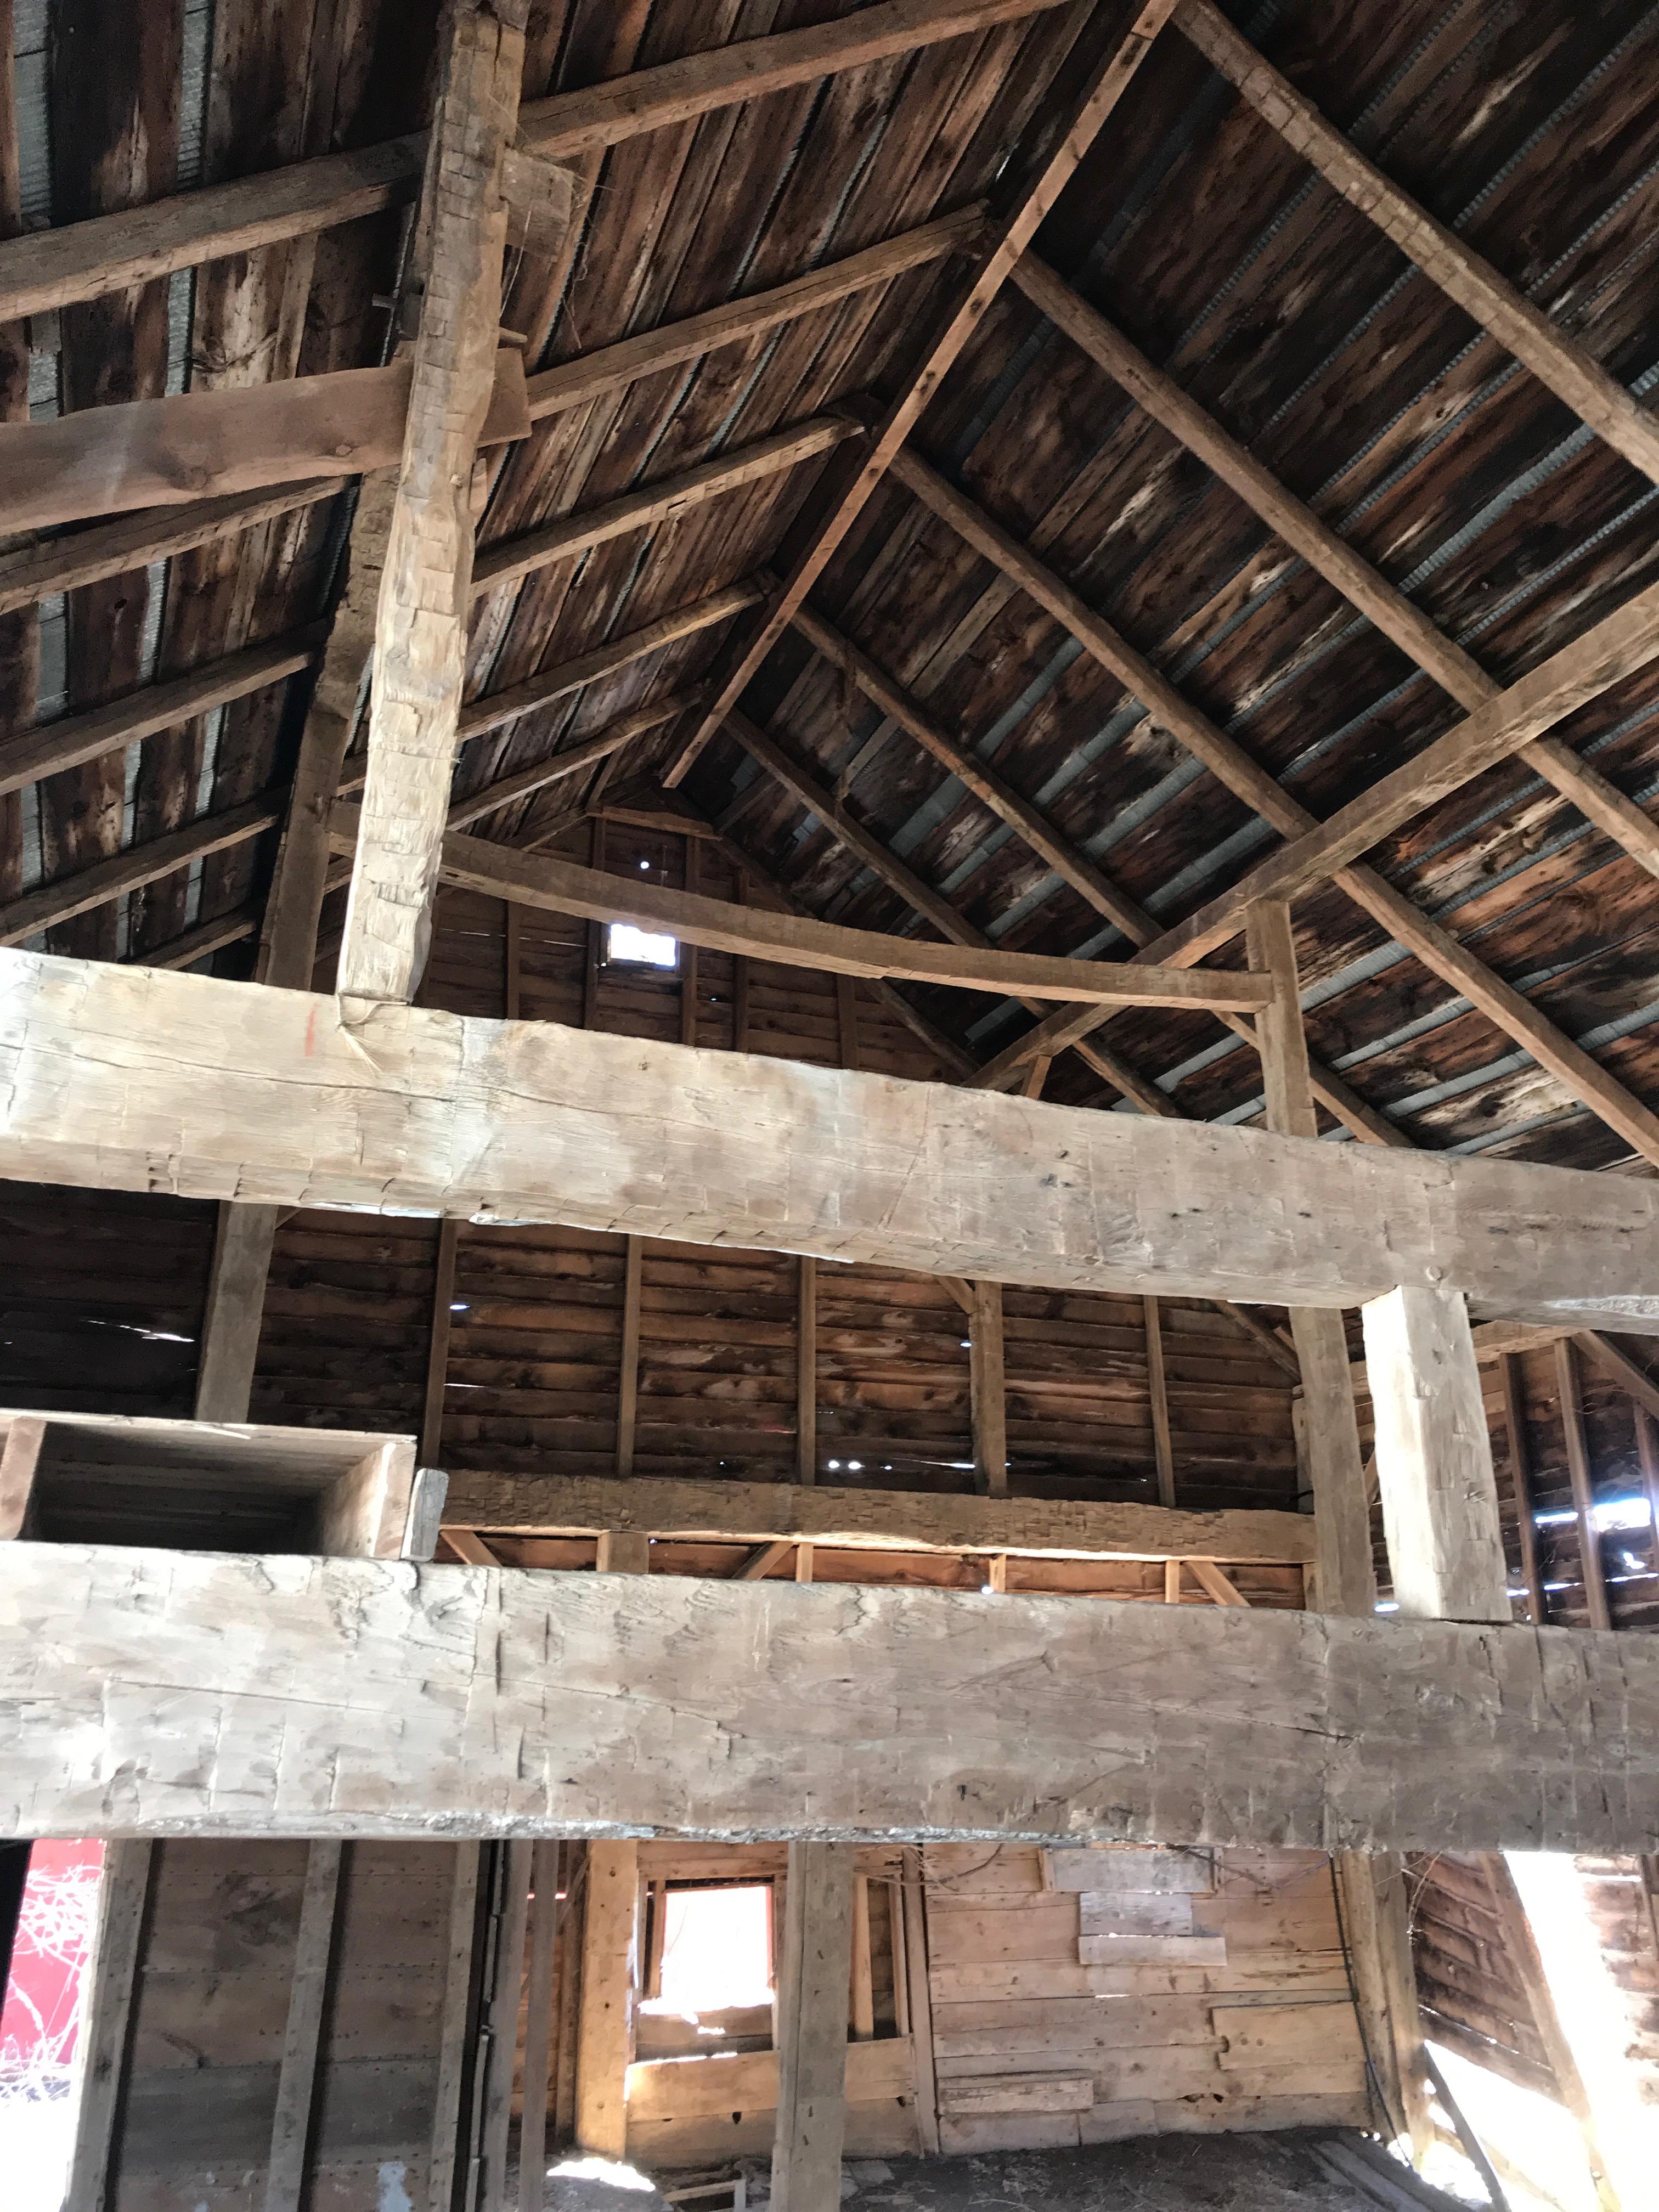 chestnut timber truss vintage barn | Green mountain timber frames